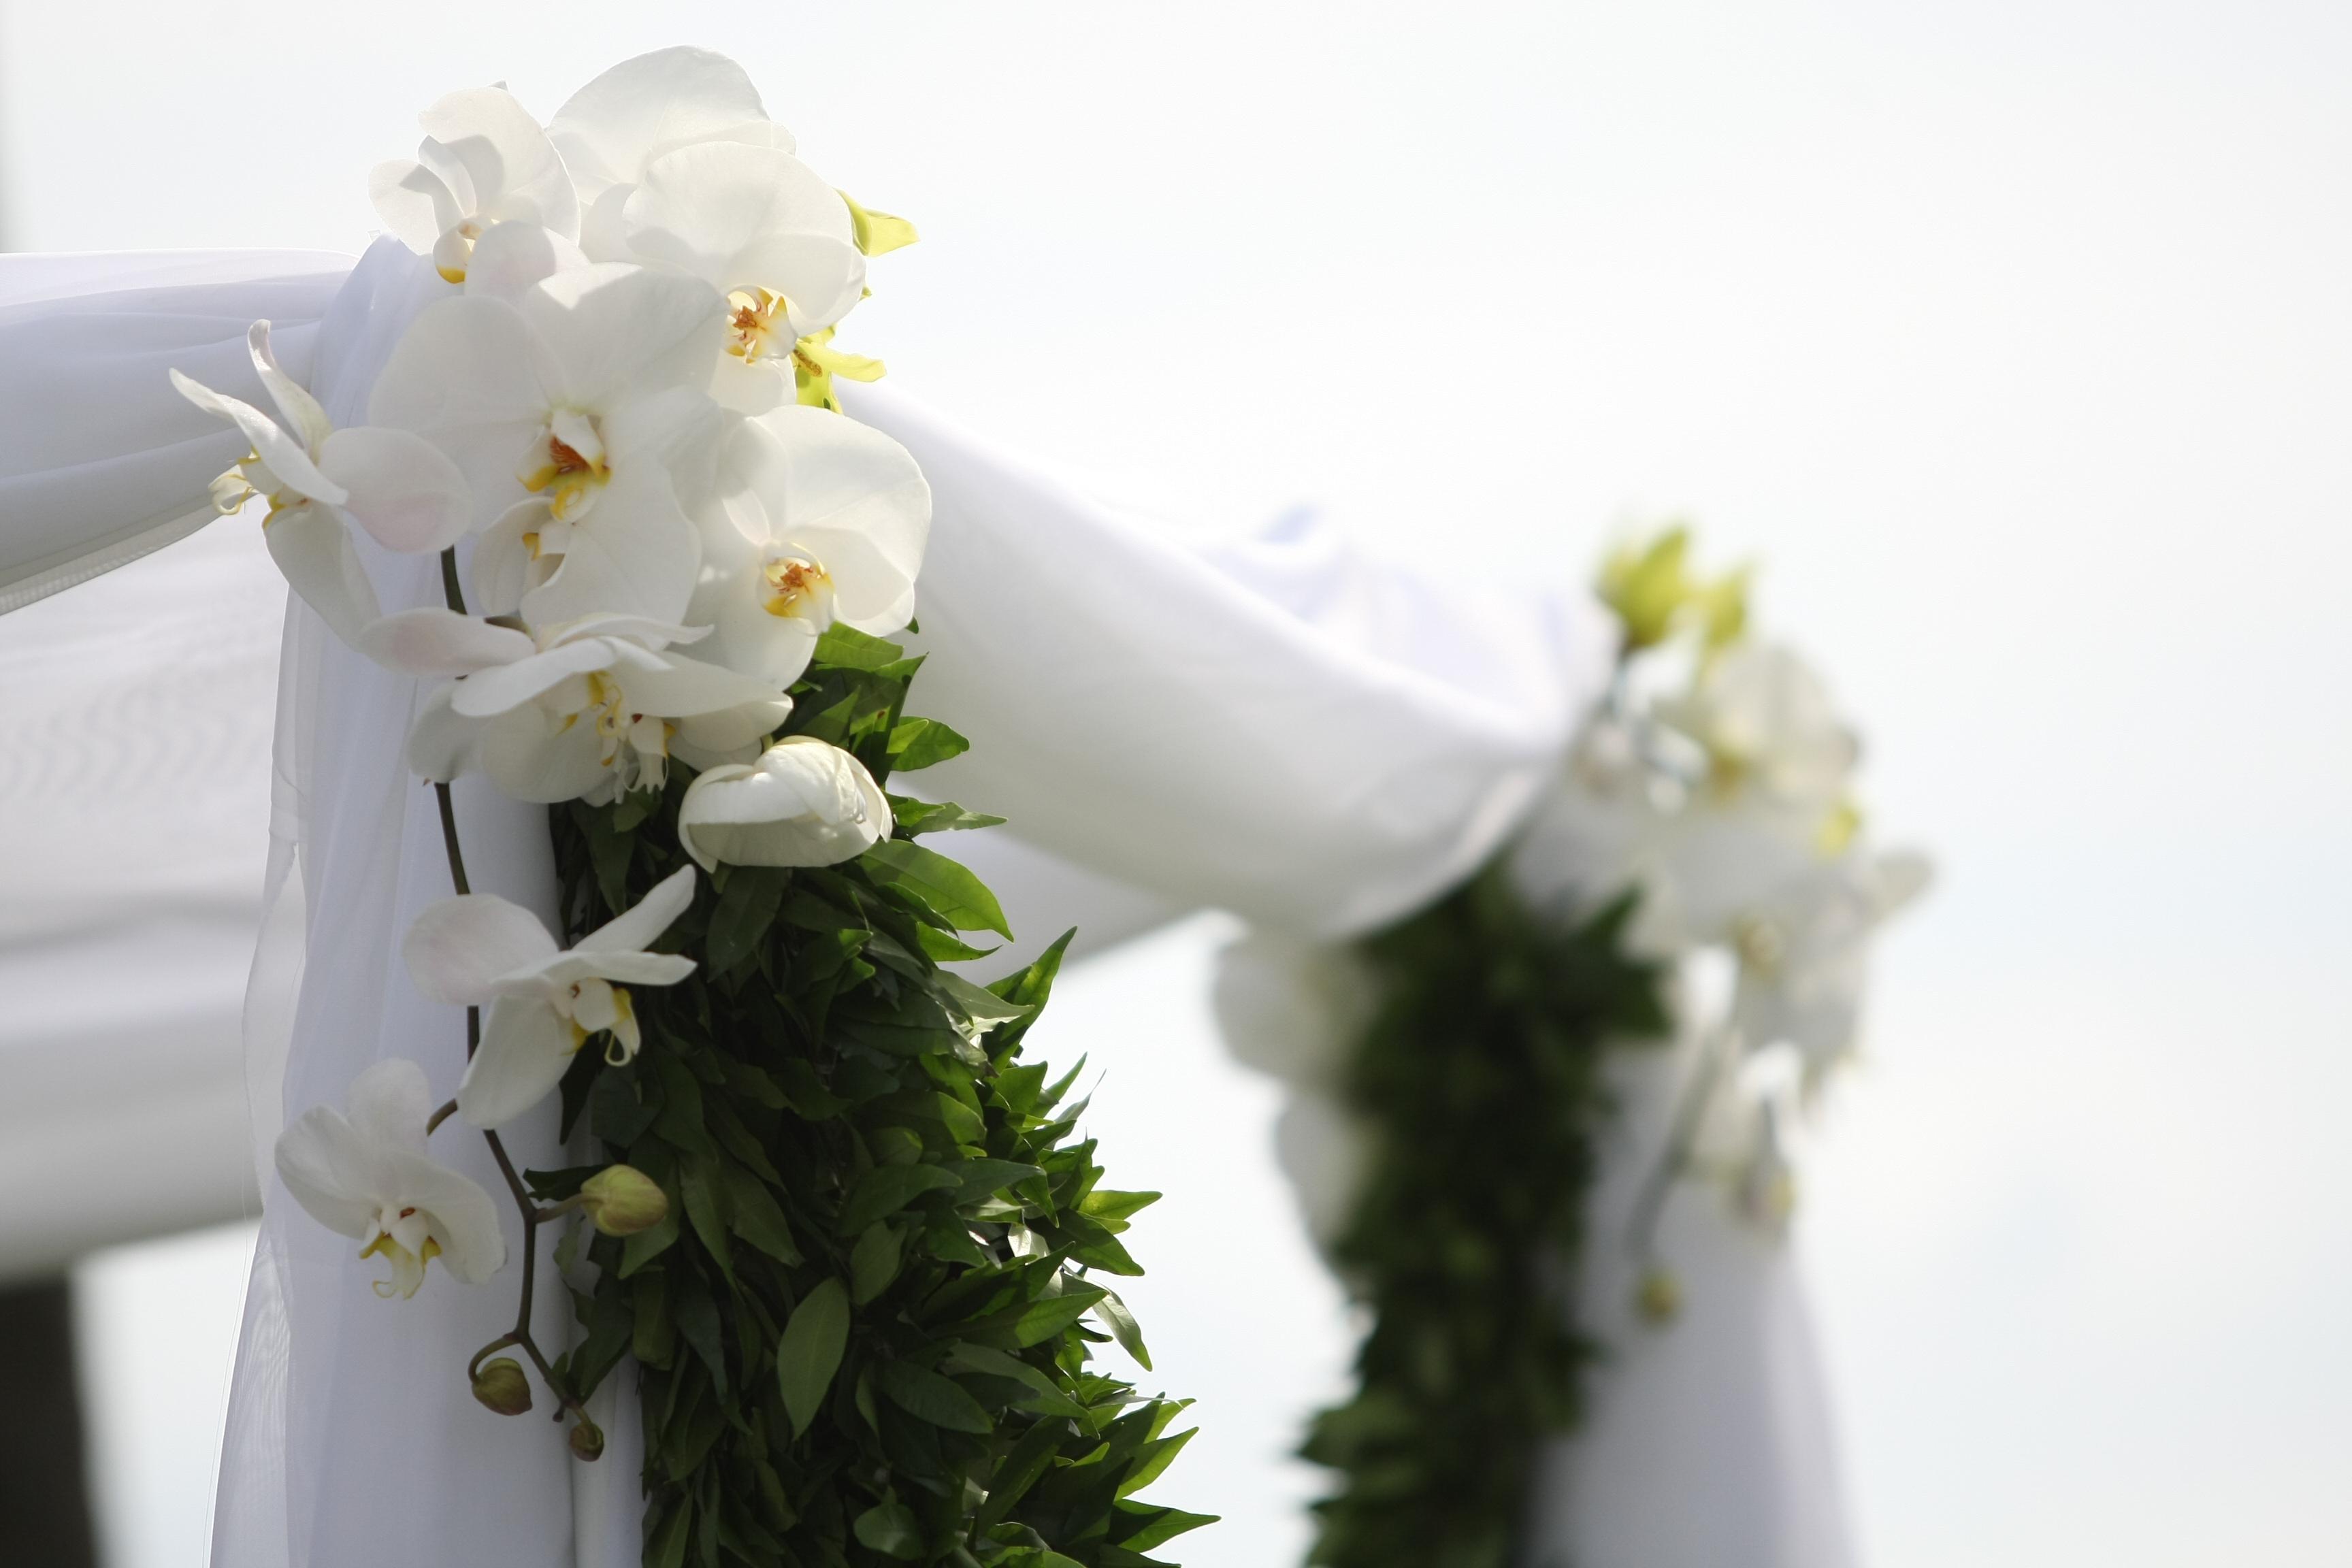 Ceremony, Flowers & Decor, white, green, Ceremony Flowers, Flowers, Decorations